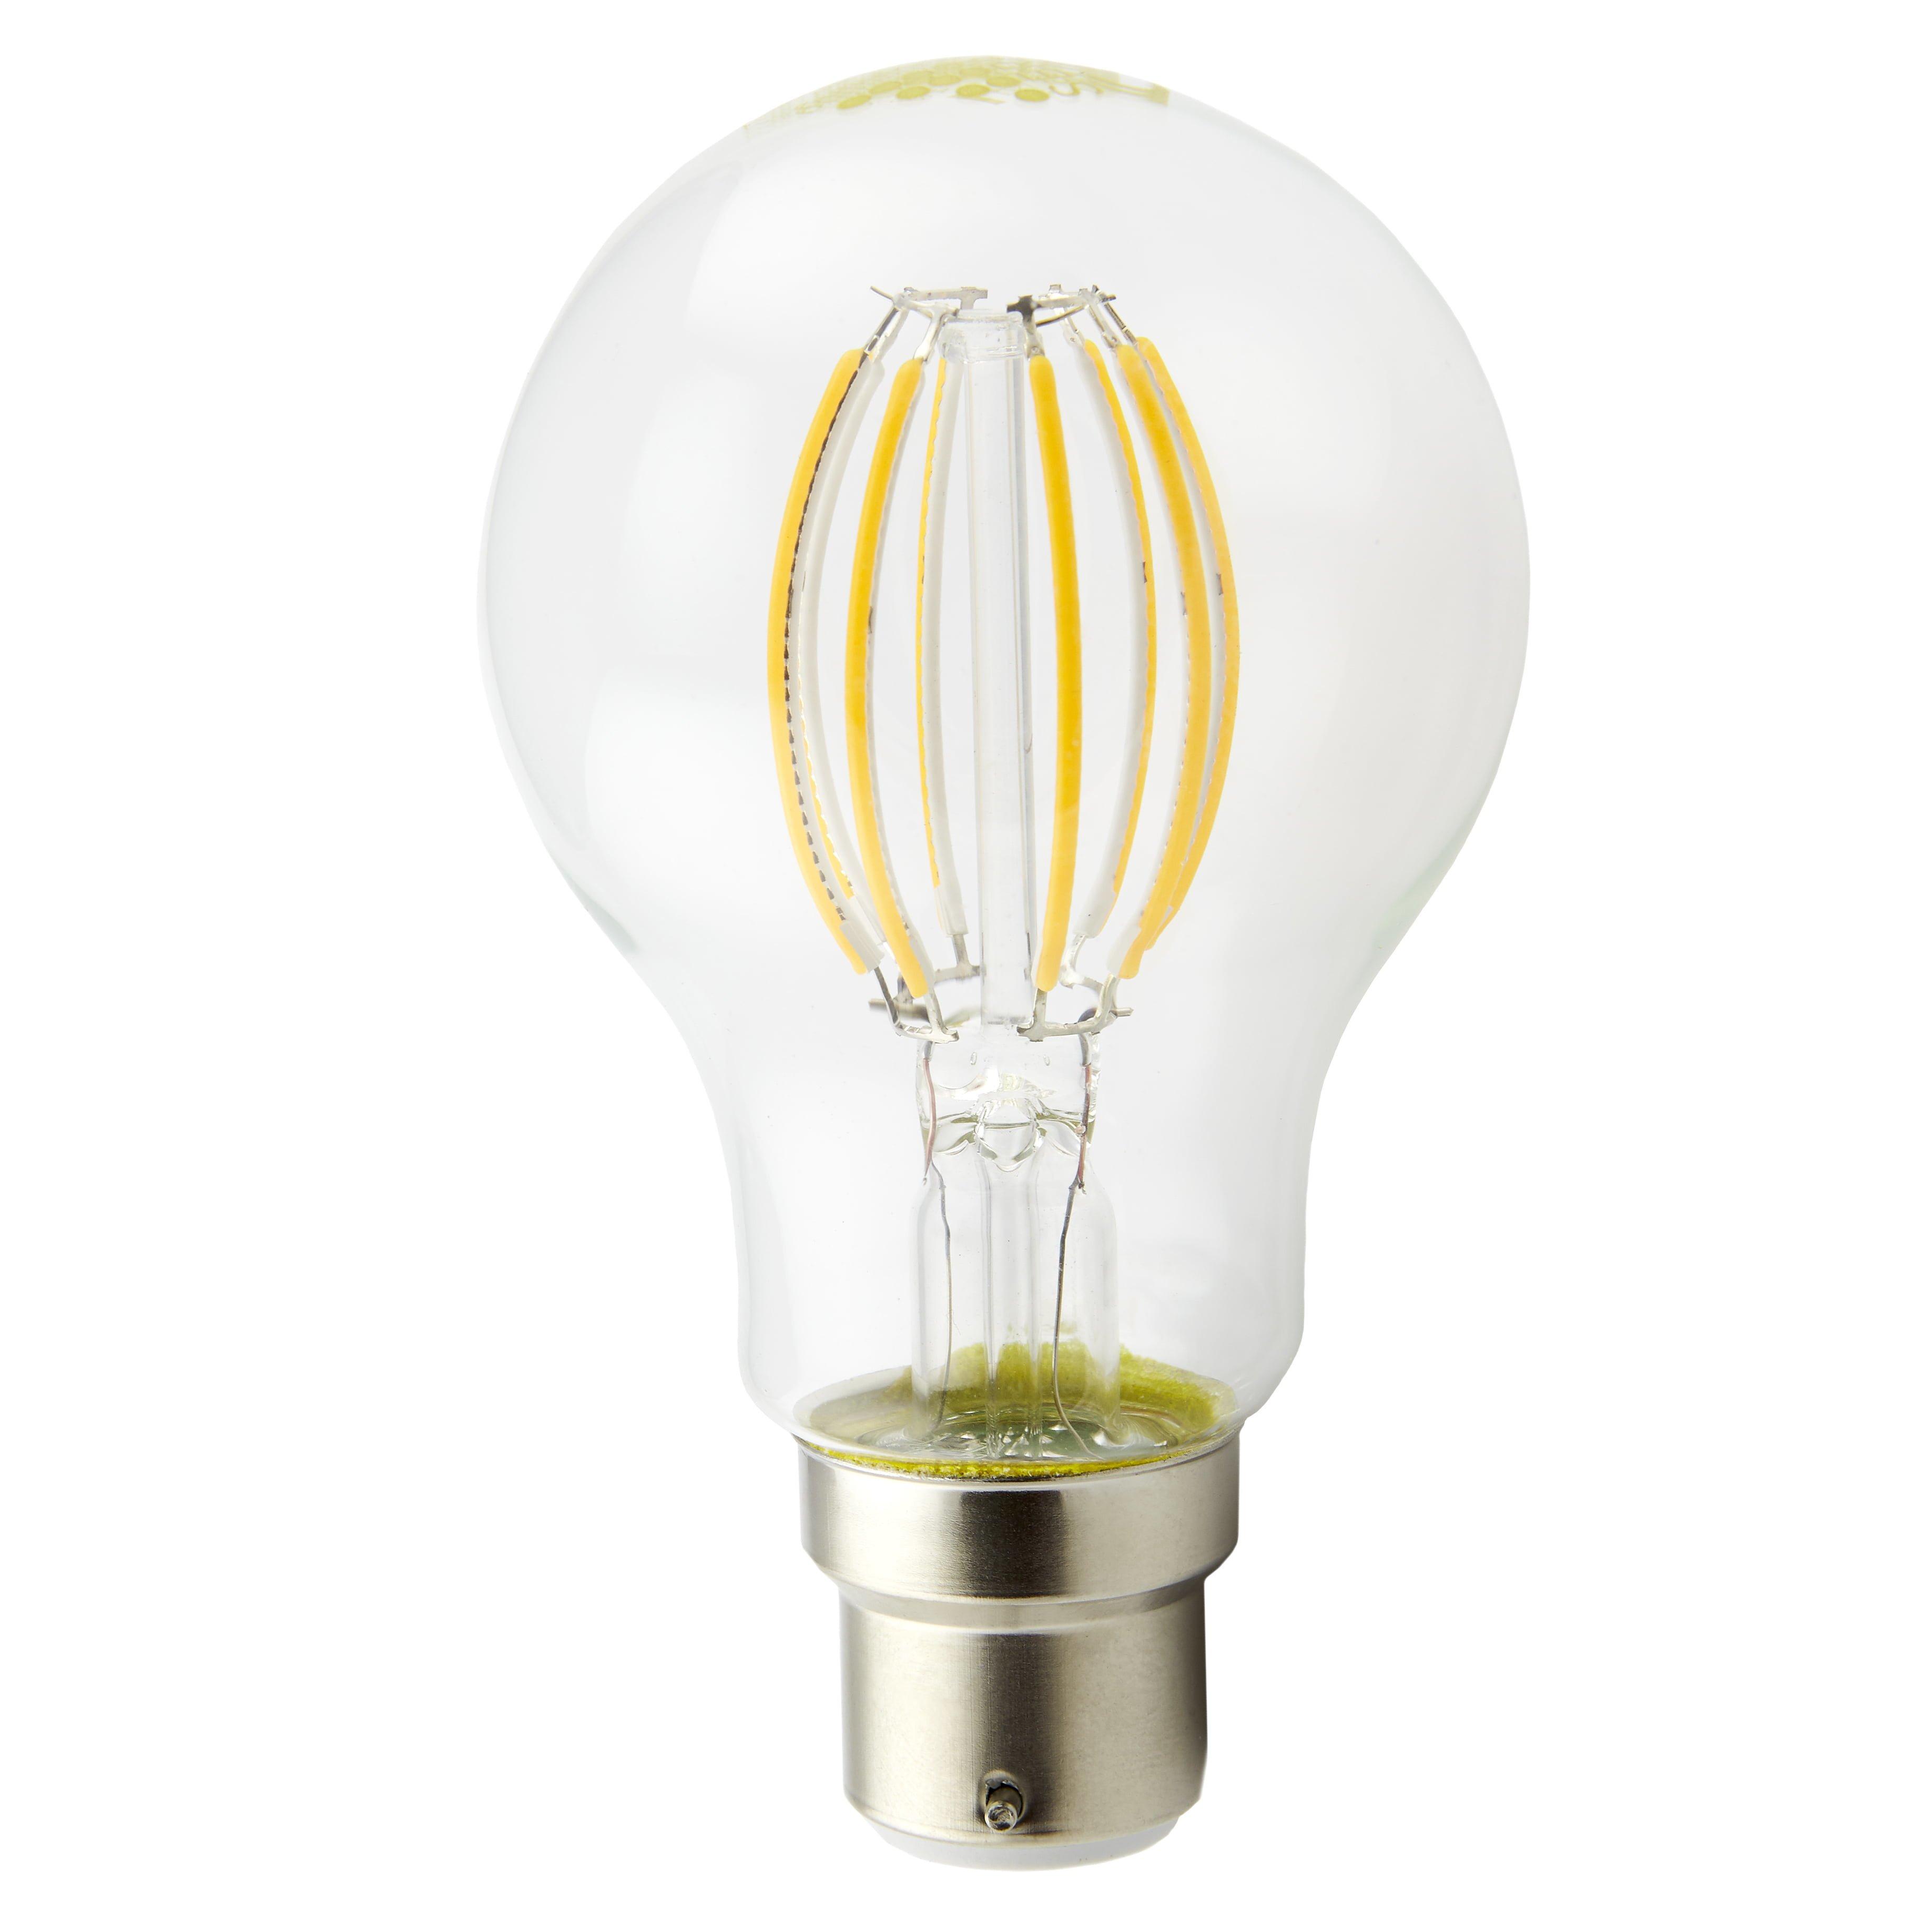 8w B22 Graphene Led Dimmable Filament Light Bulb Sera Technologies